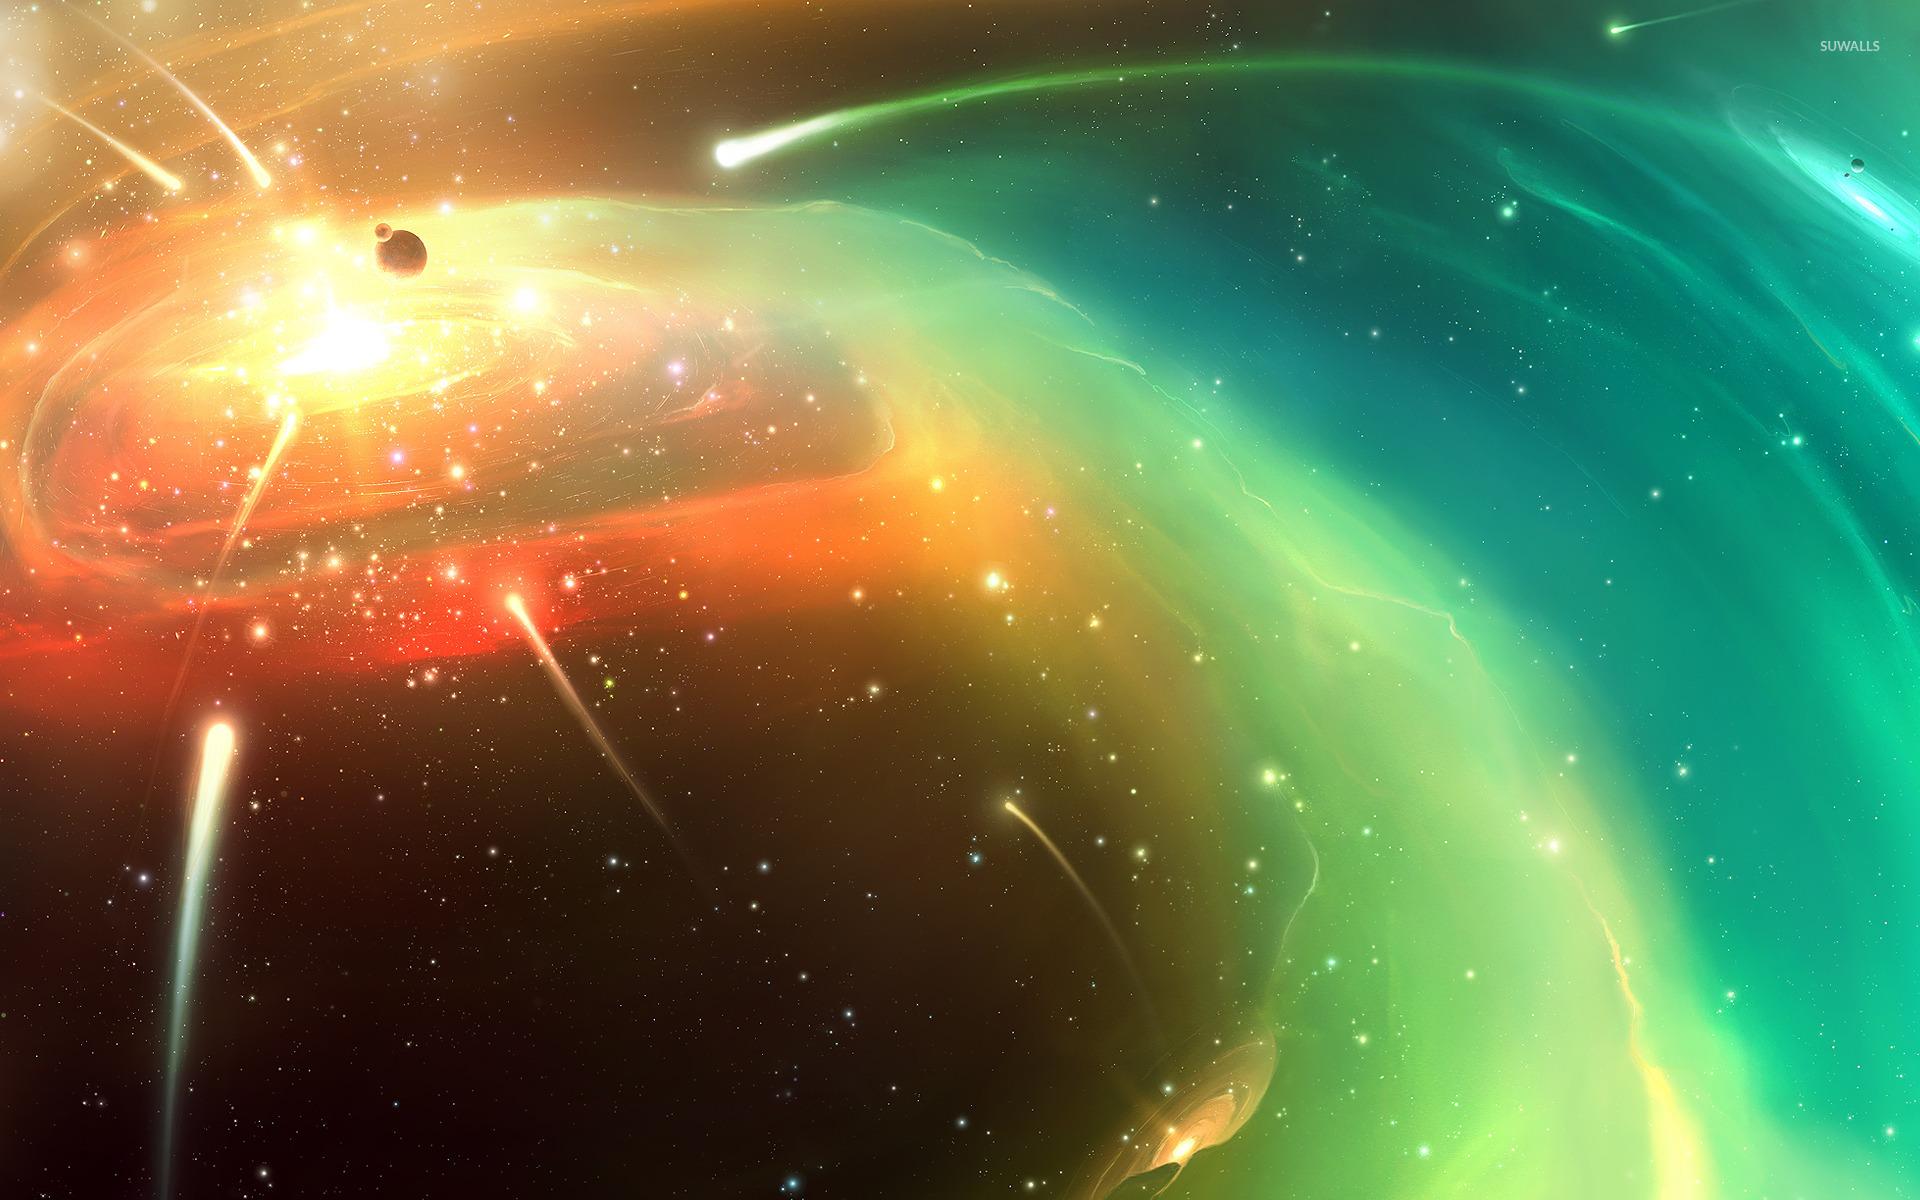 purple planet star comet - photo #28